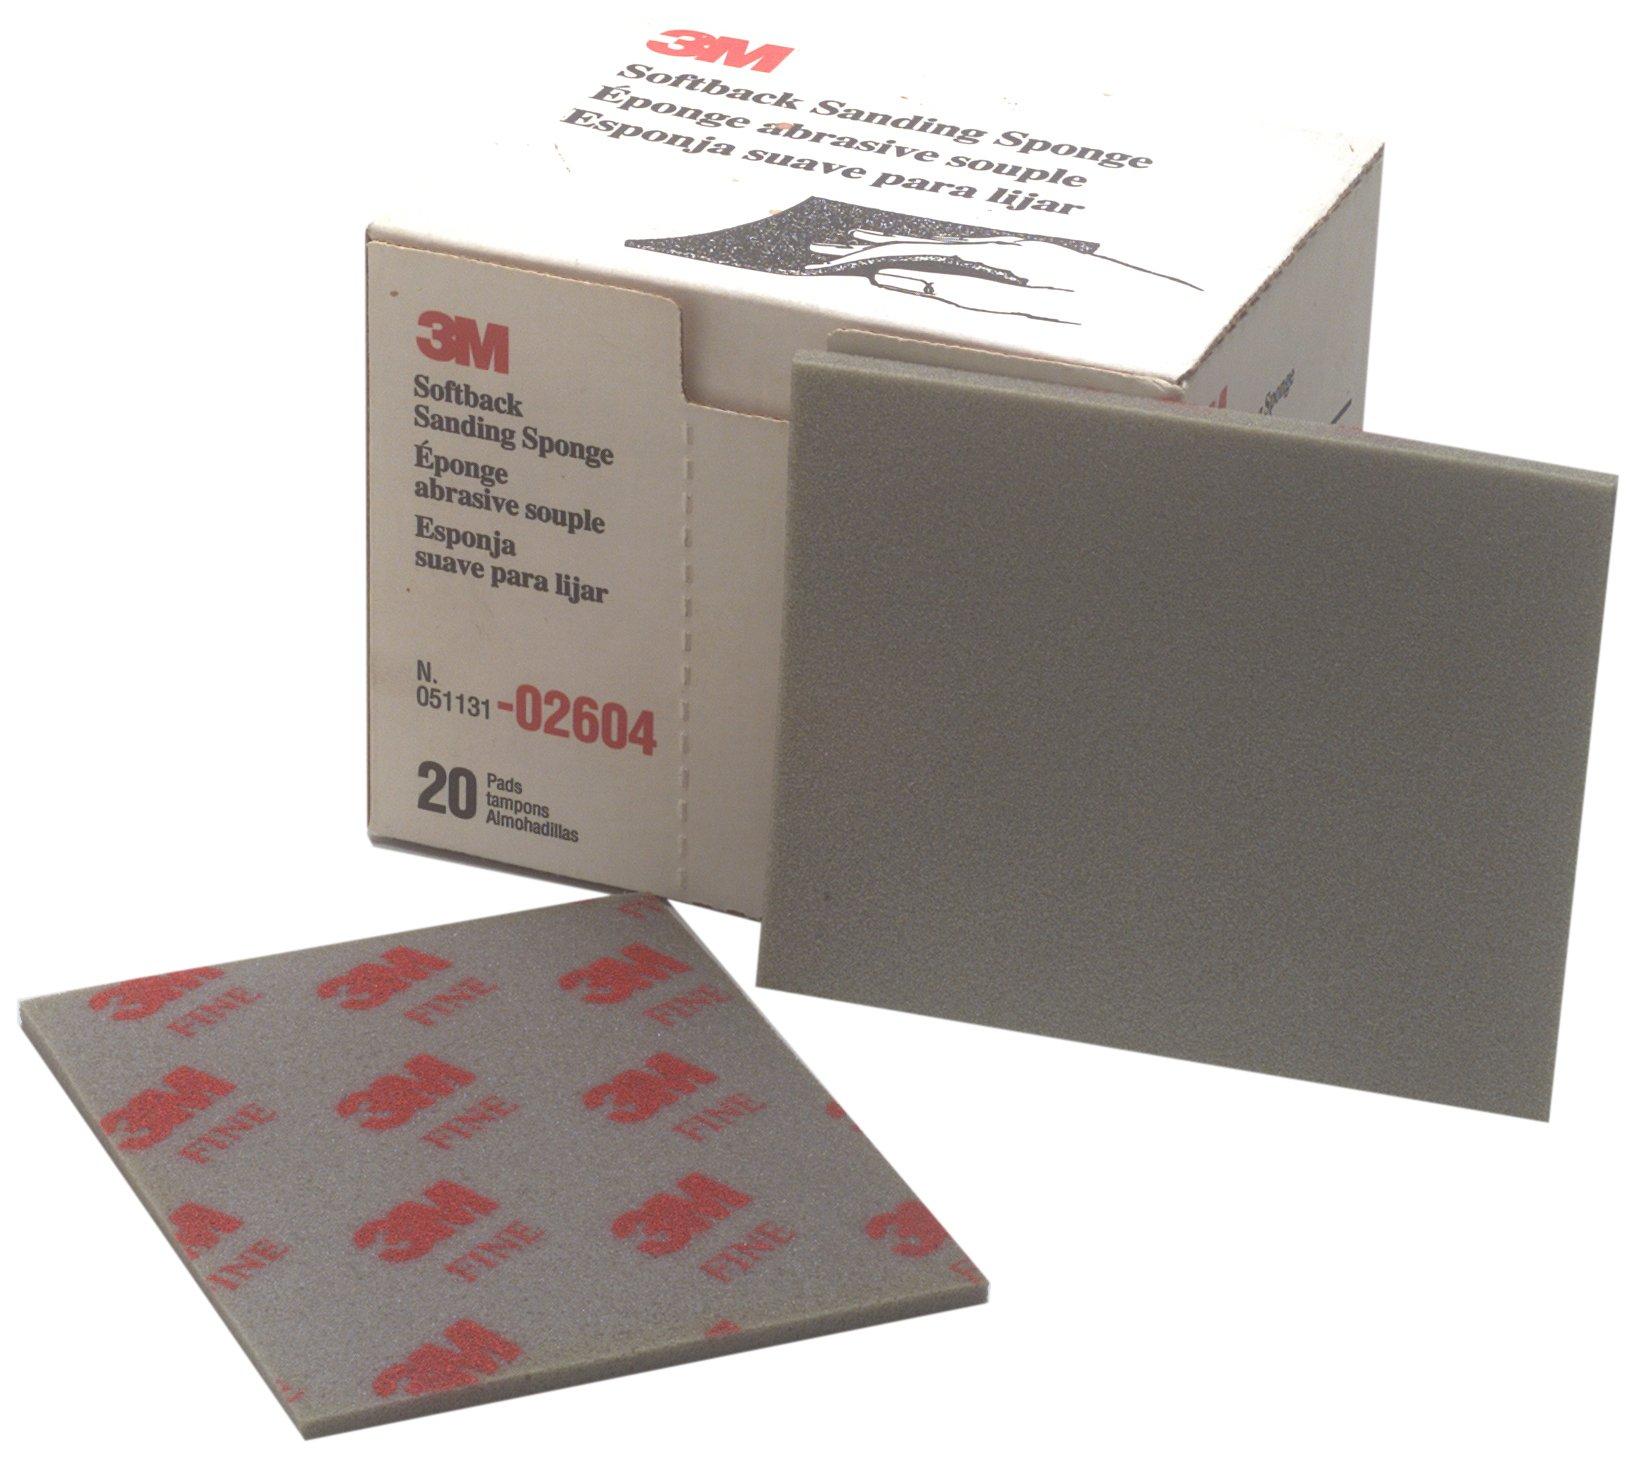 3M 02604 4-1/2'' x 5-1/2'' Fine Softback Sanding Sponge (Pack of 6) by 3M (Image #1)